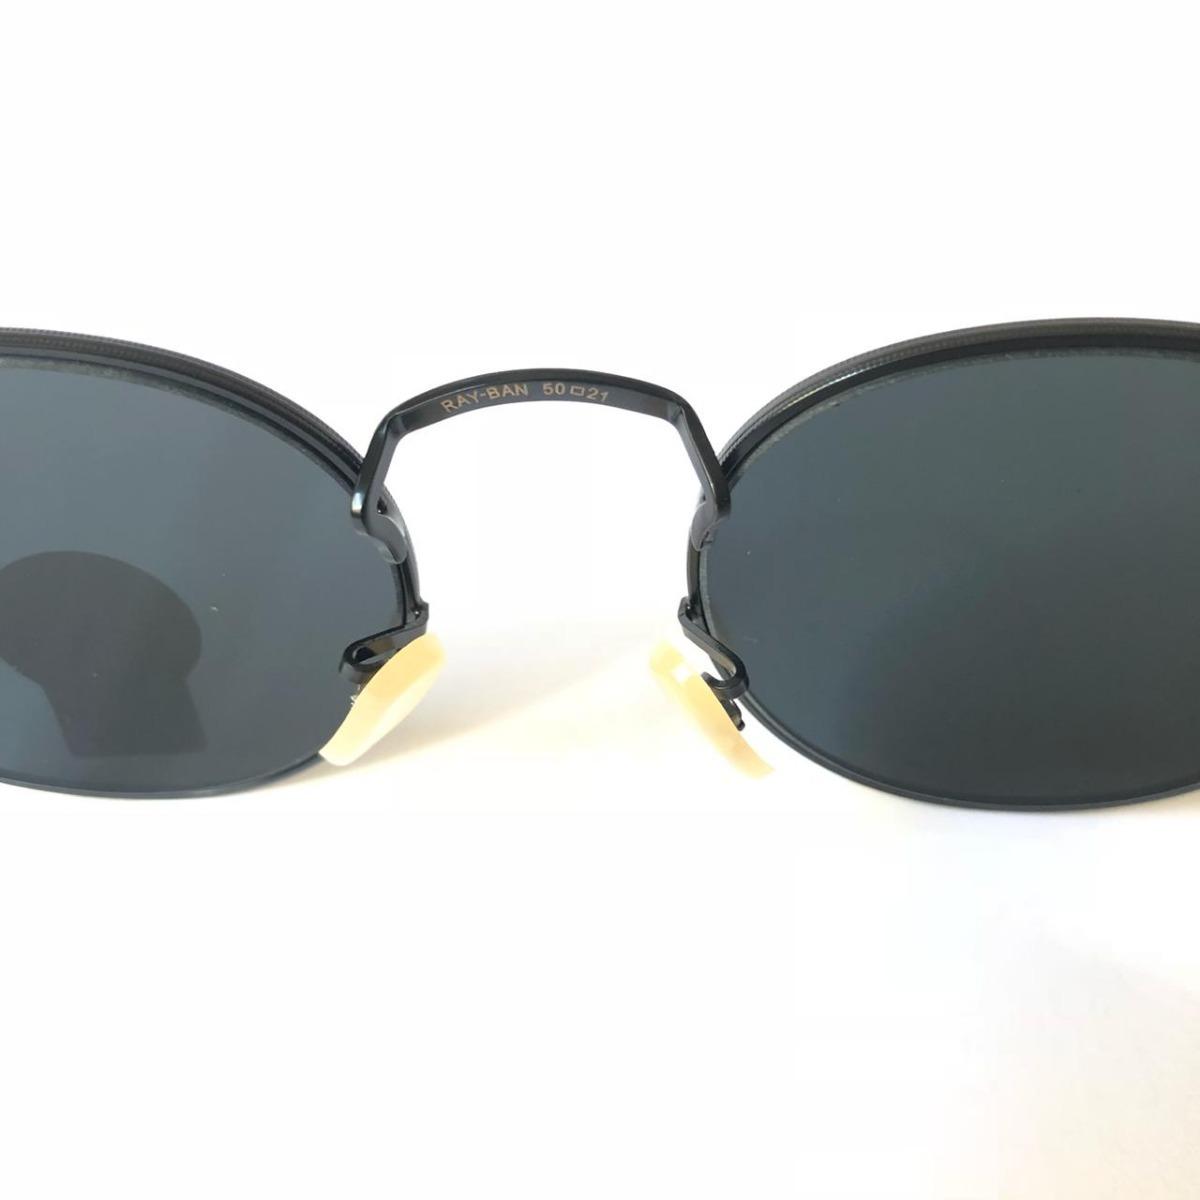 53fafe5ab59d8 oculos de sol unissex feminino redondo retro masculino uv400. Carregando  zoom.